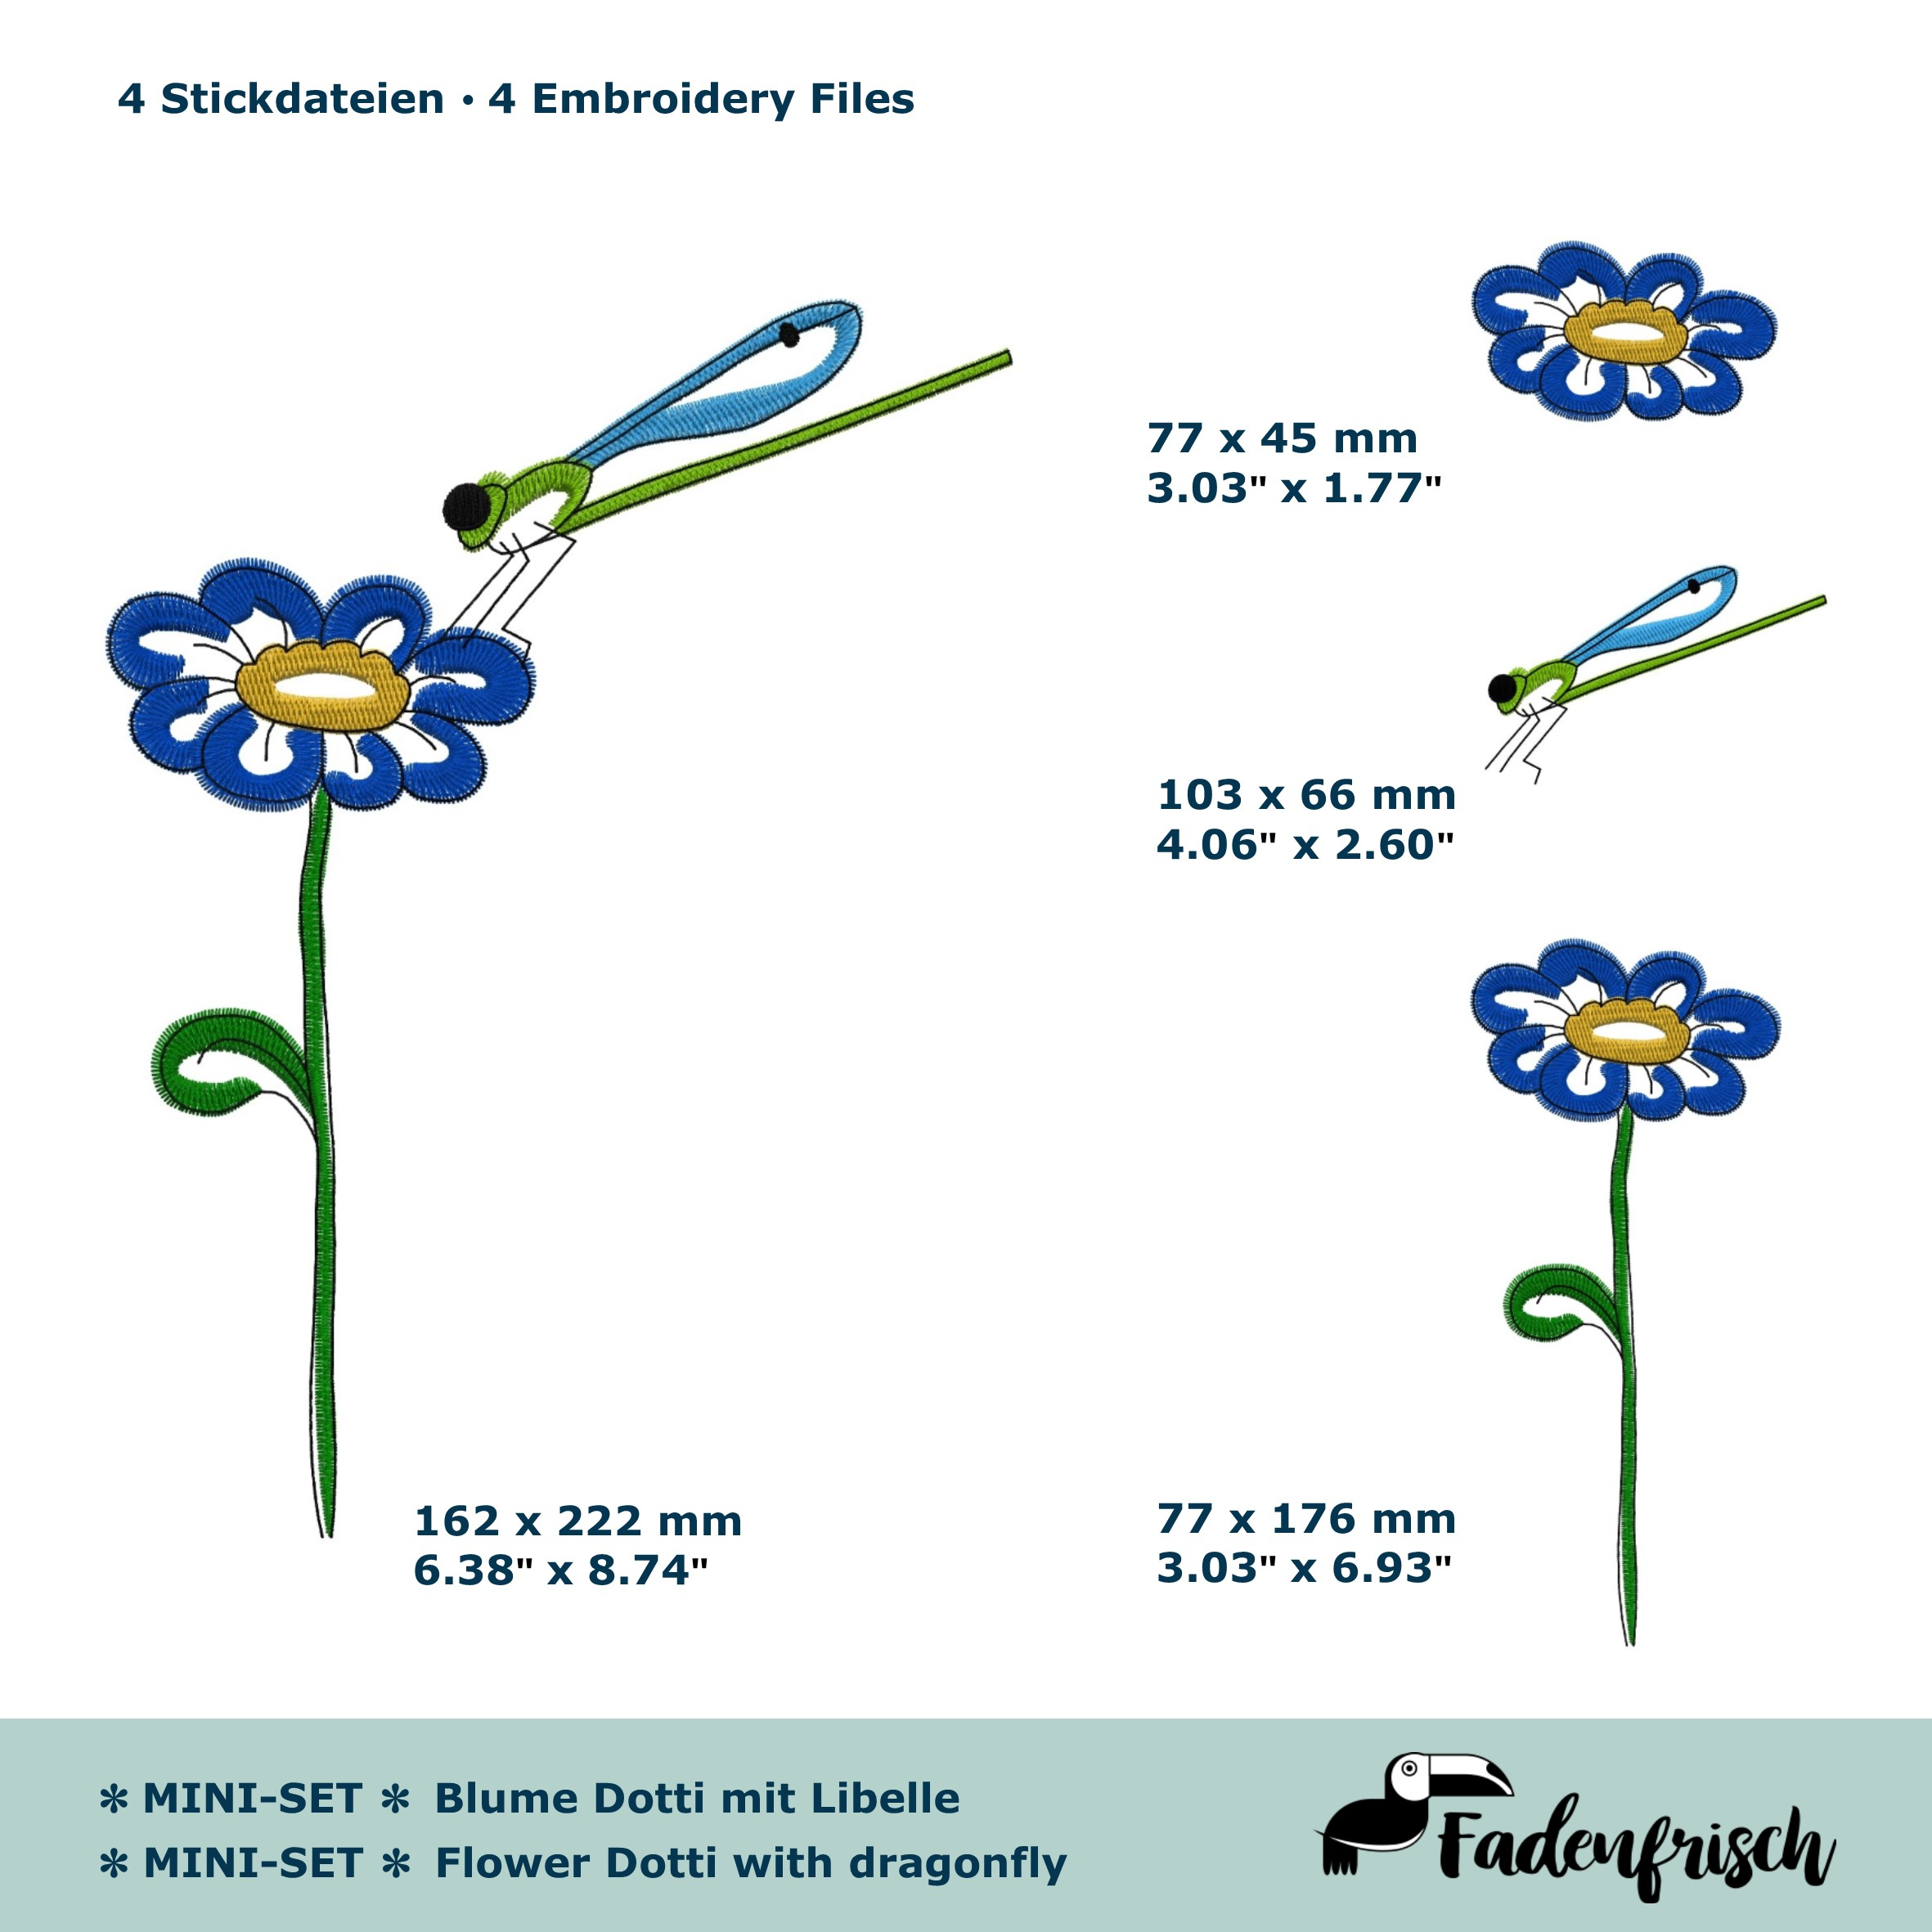 Mini-Set Blume Dotti mit Libelle - 4 Stickdateien